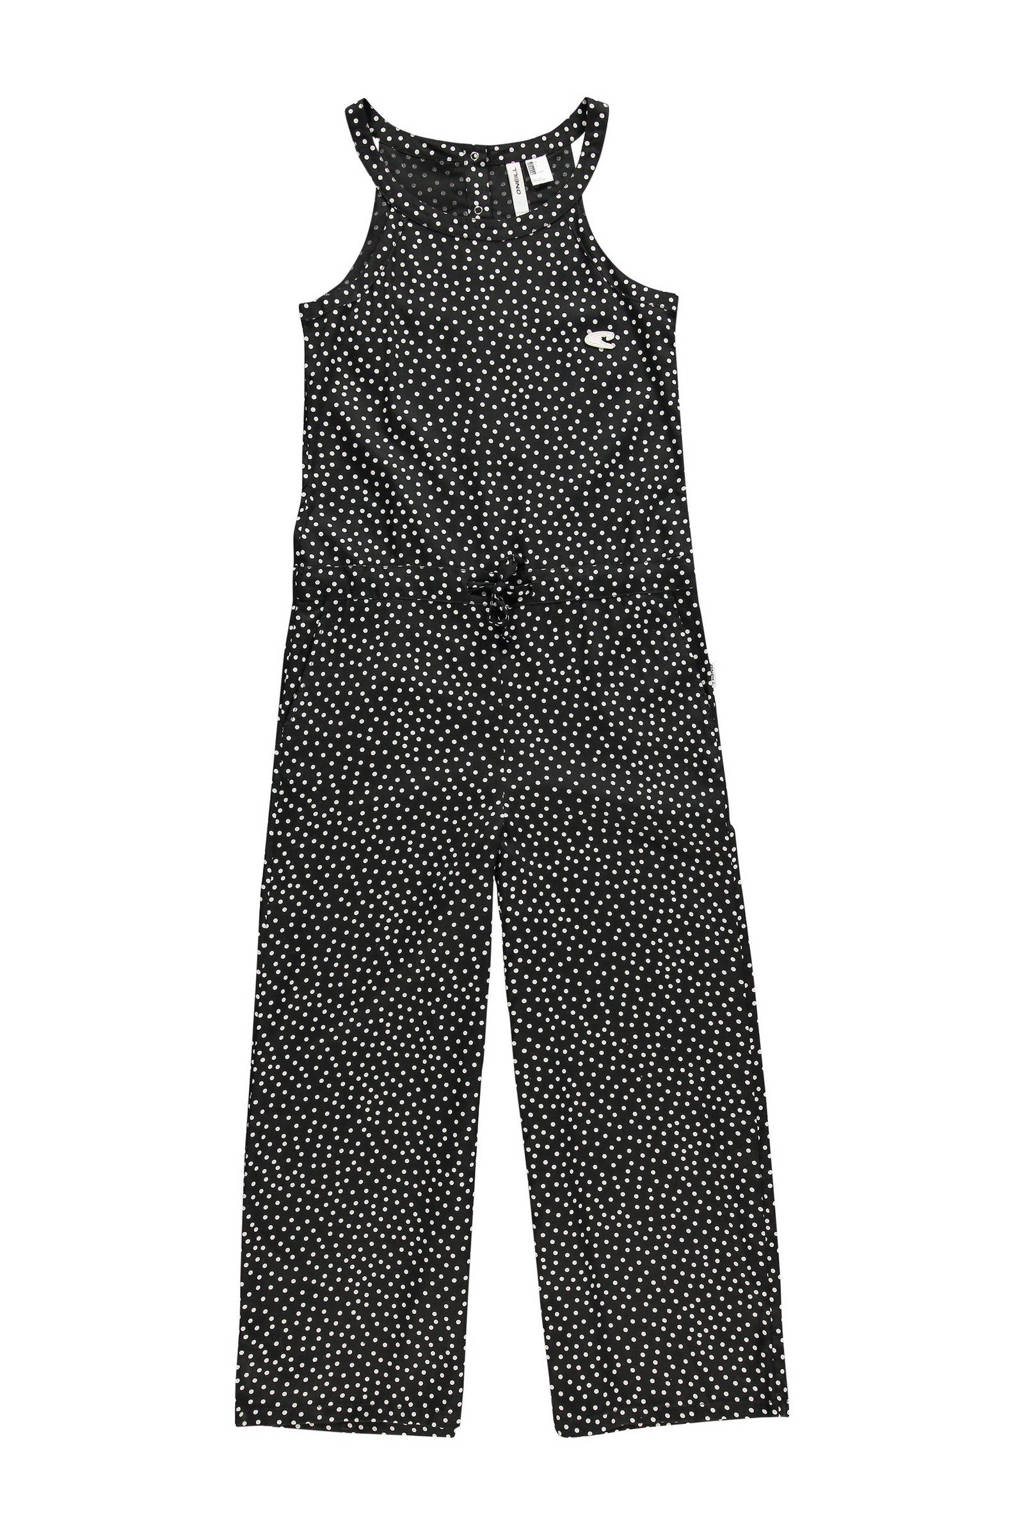 O'Neill jumpsuit met all over print zwart/wit, Zwart/wit